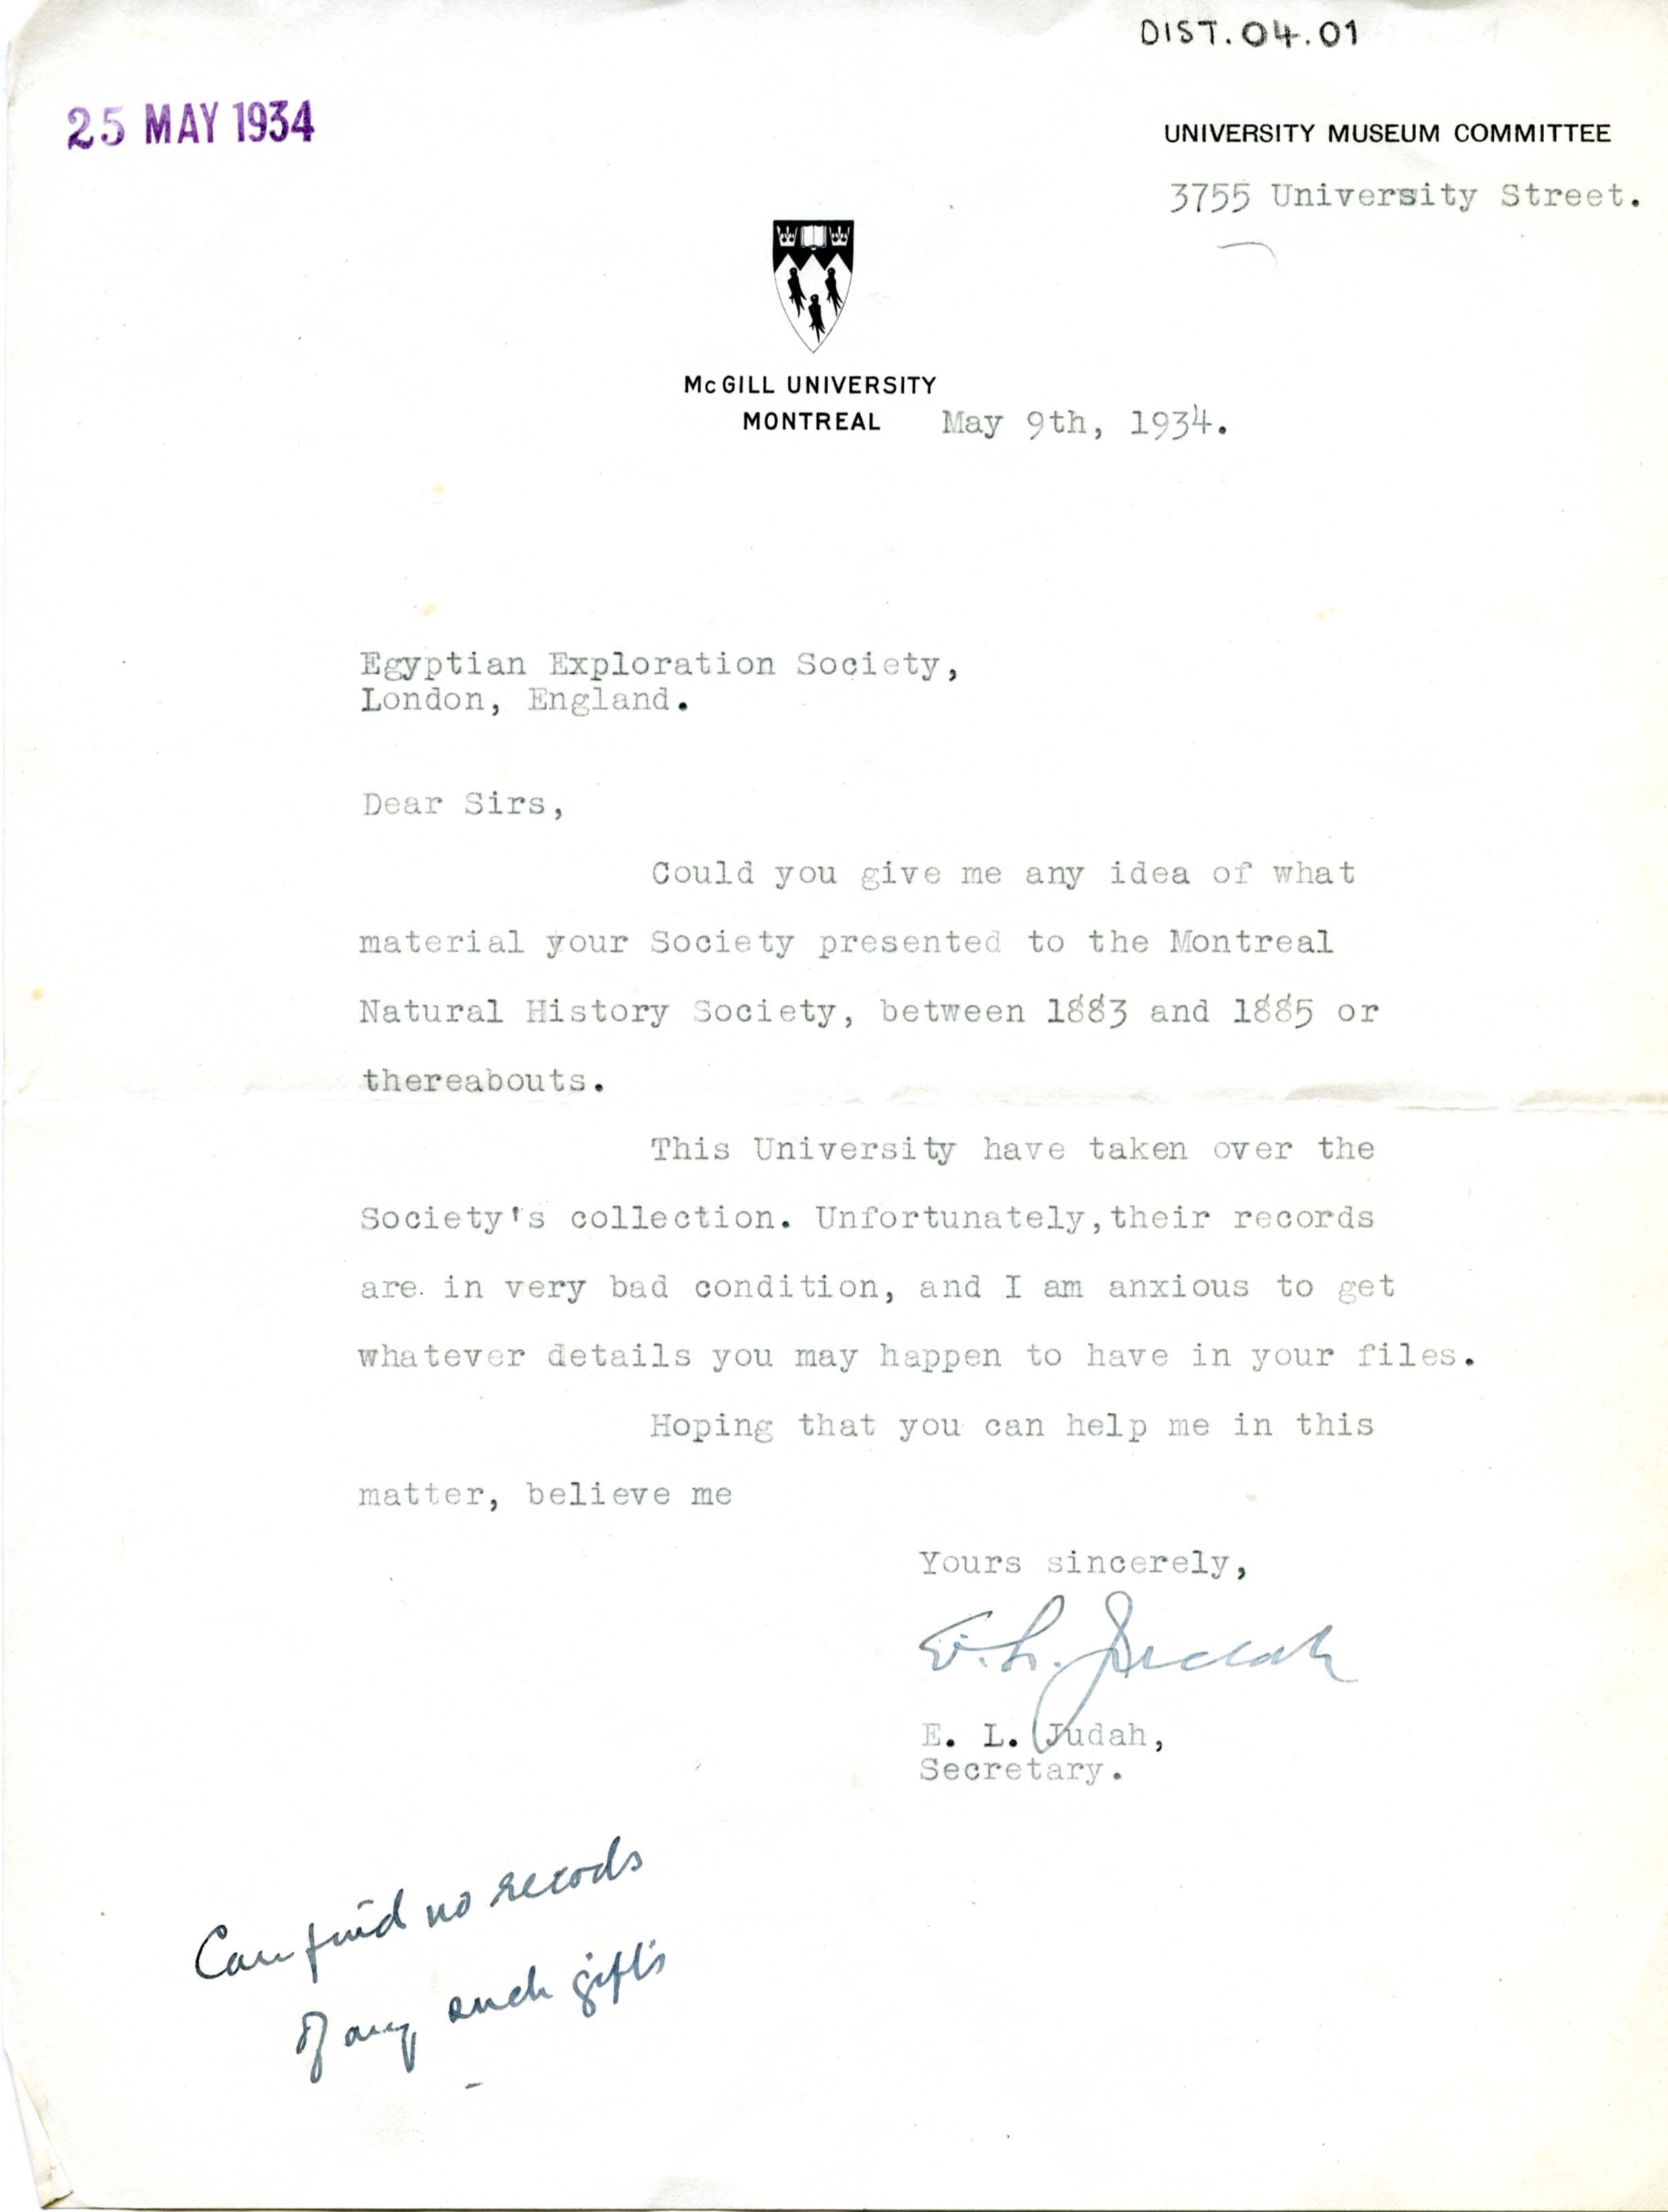 1883-1885 Tell el-Maskhuta, Tanis, Tell el-Yahudiya Correspondence DIST.04.01